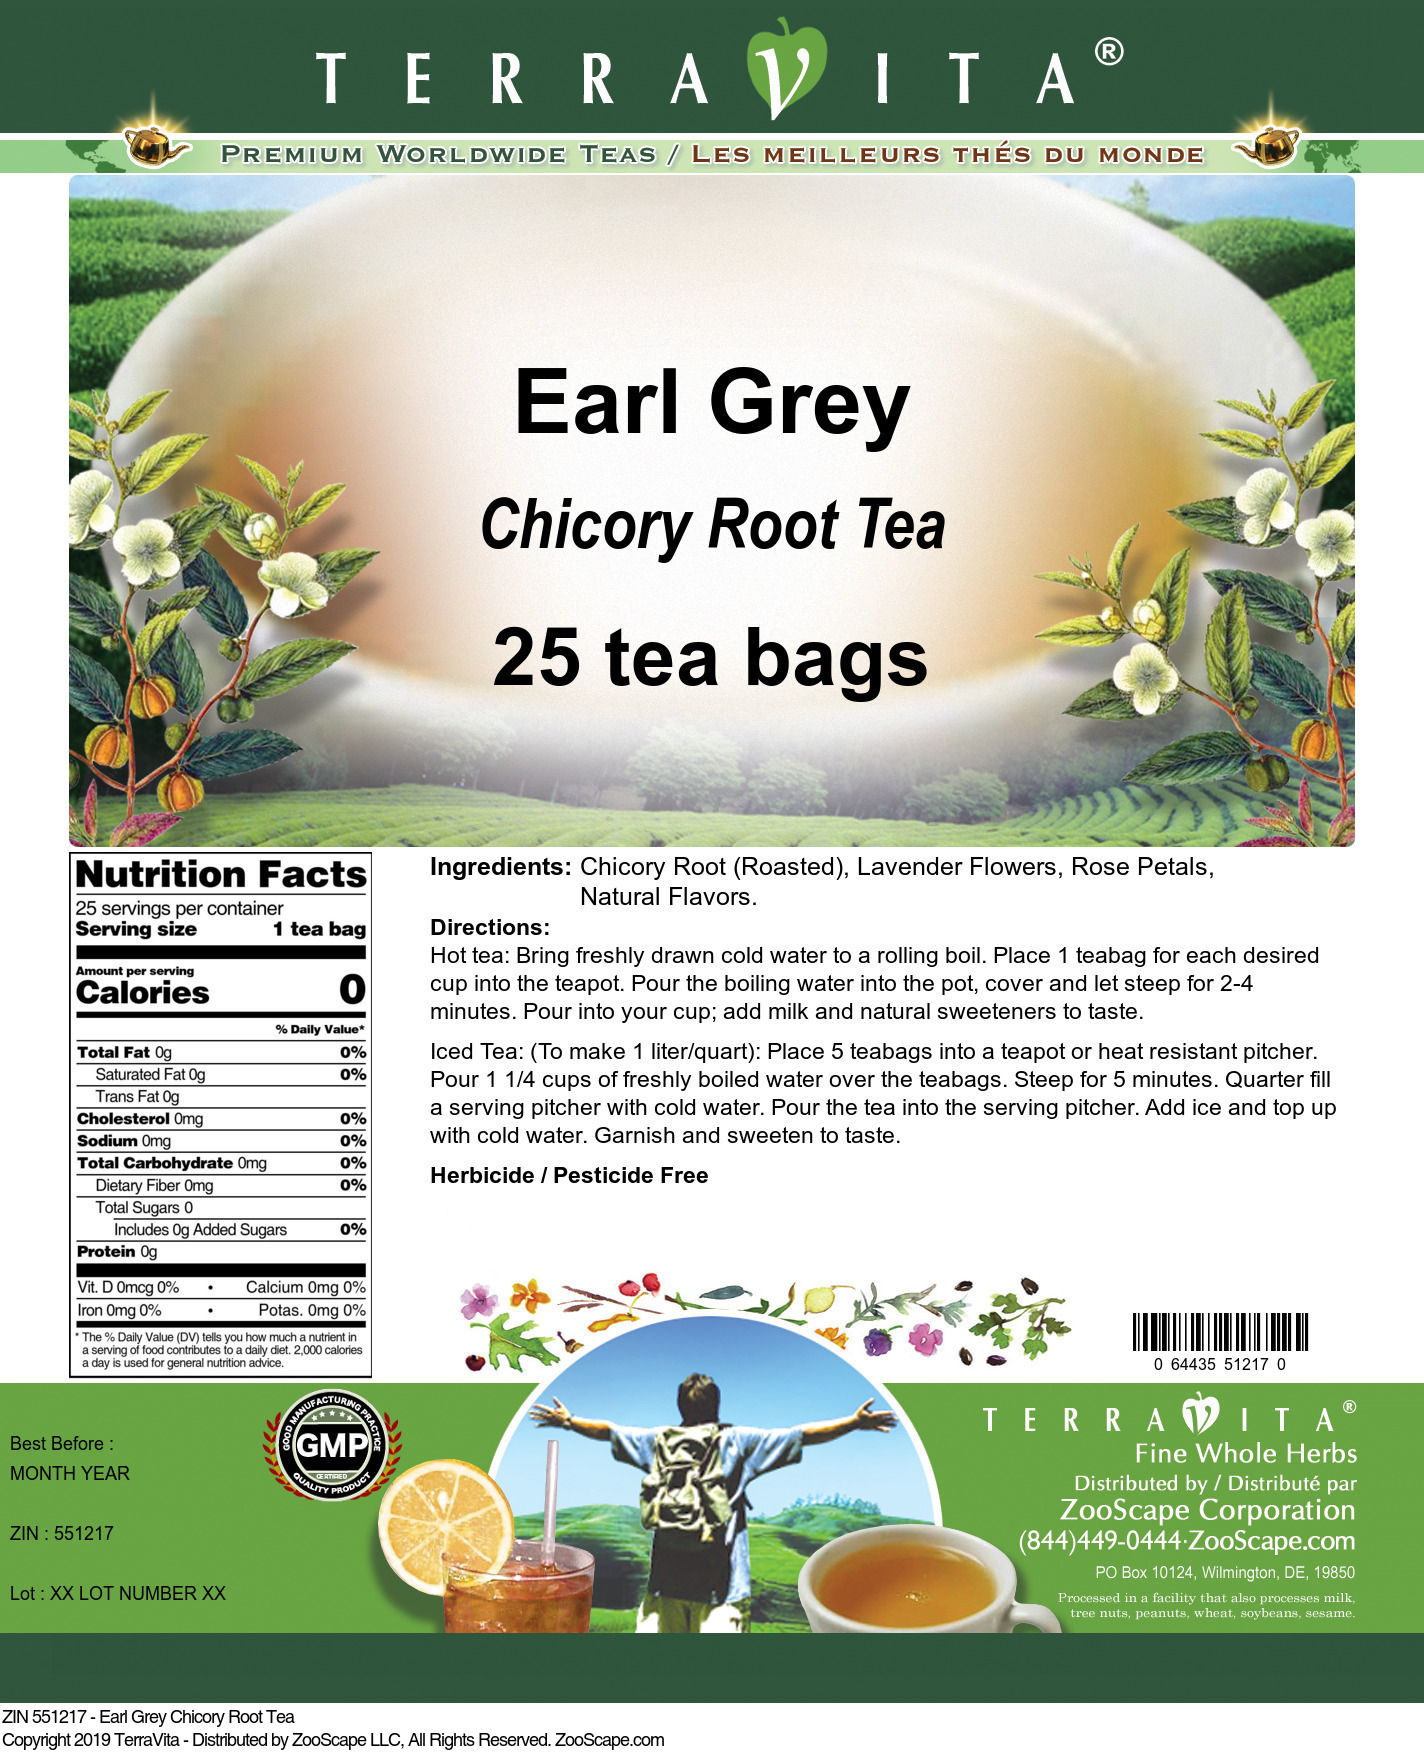 Earl Grey Chicory Root